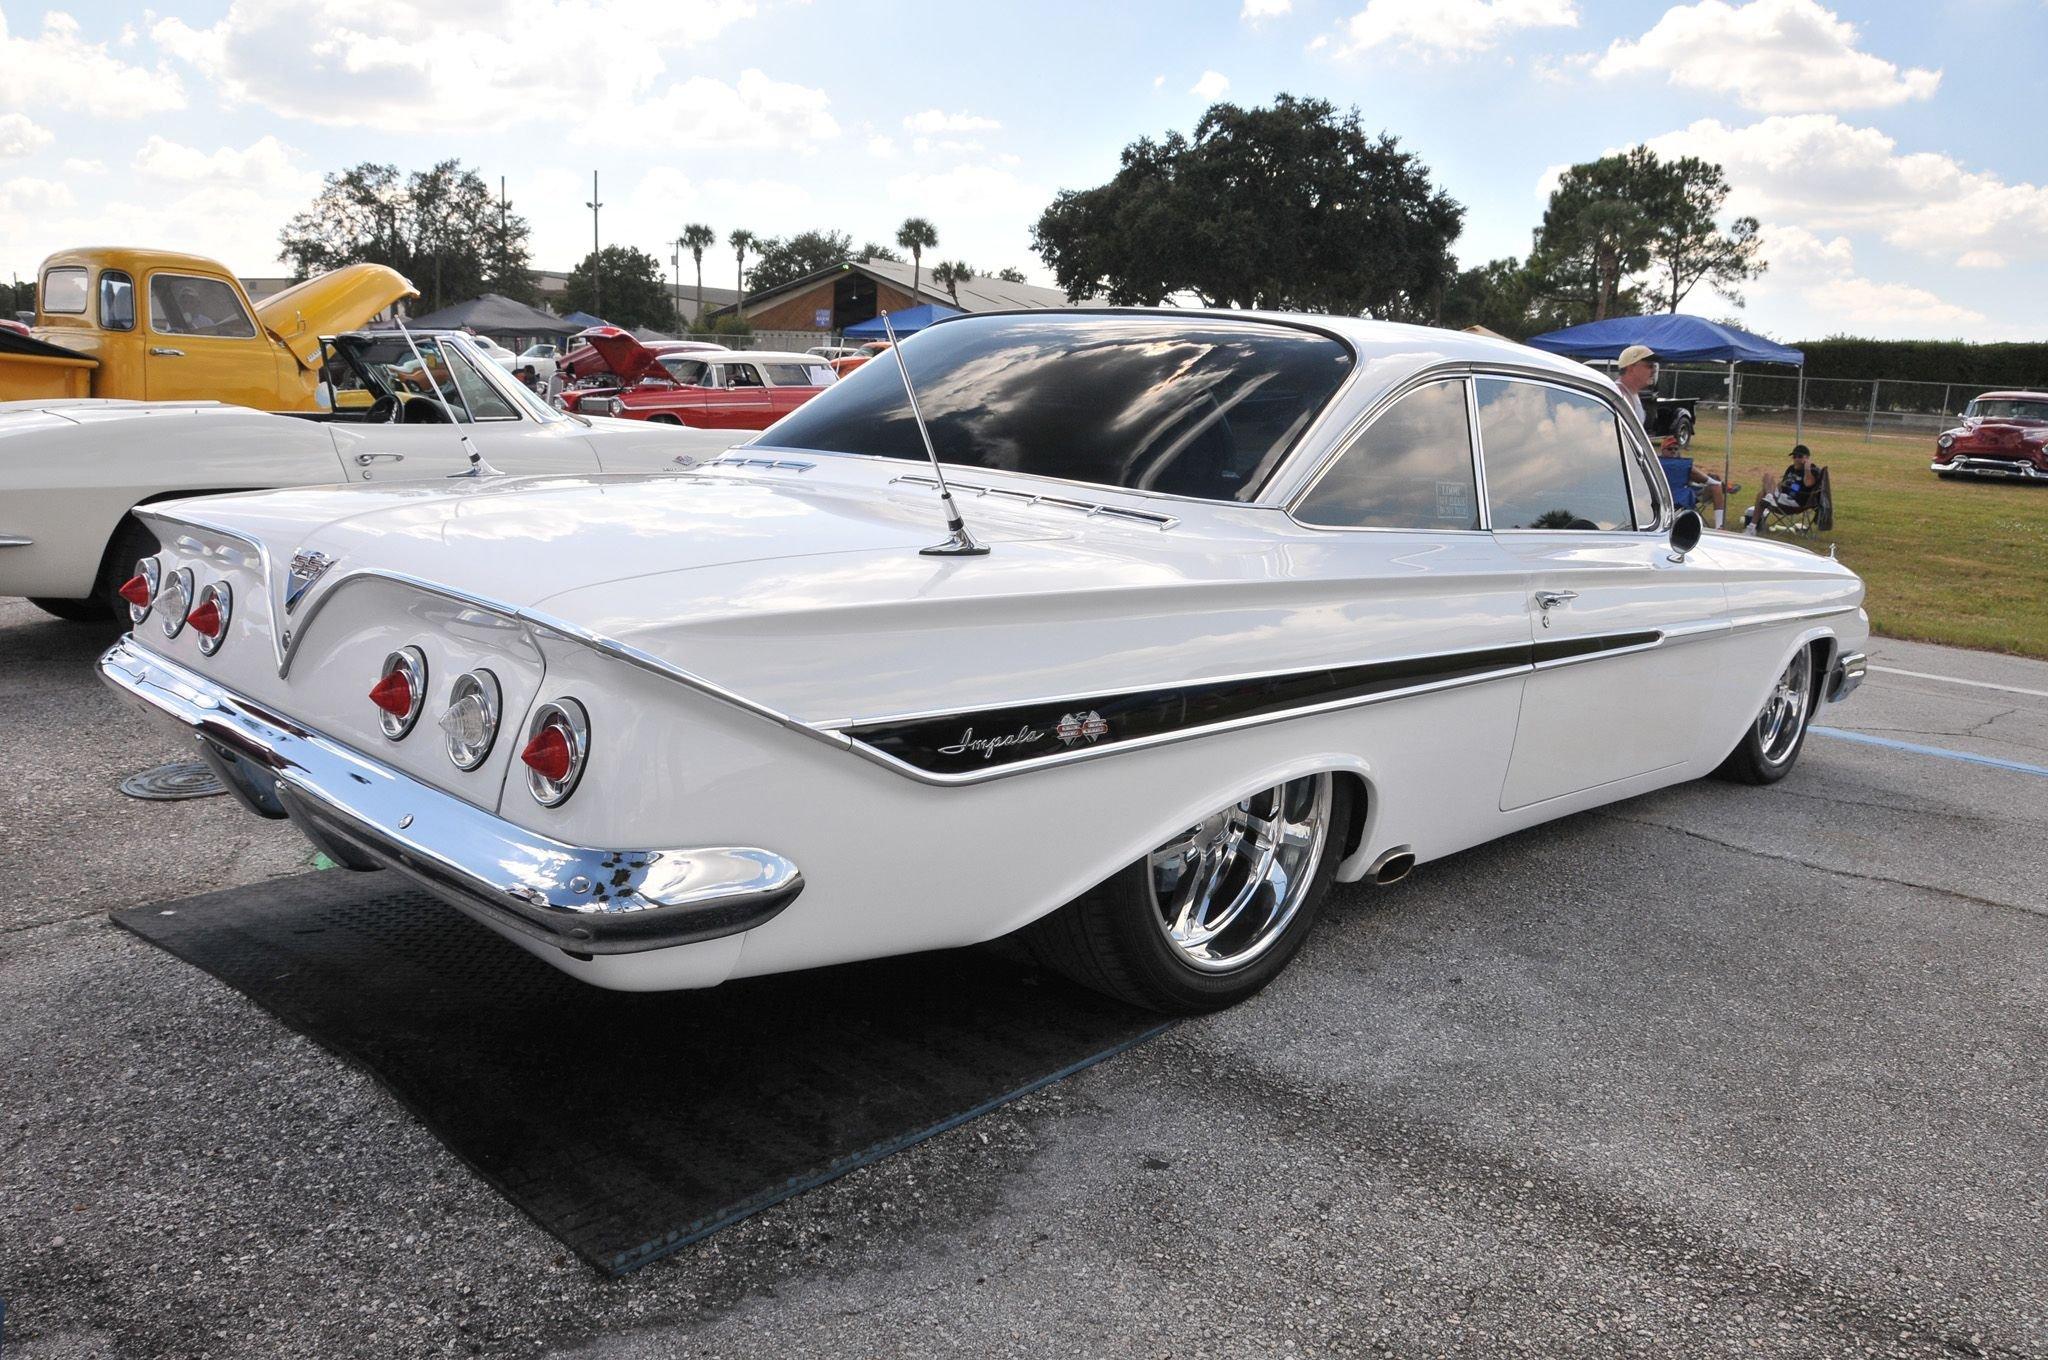 1961 Chevrolet Impala Hardtop-02 wallpaper